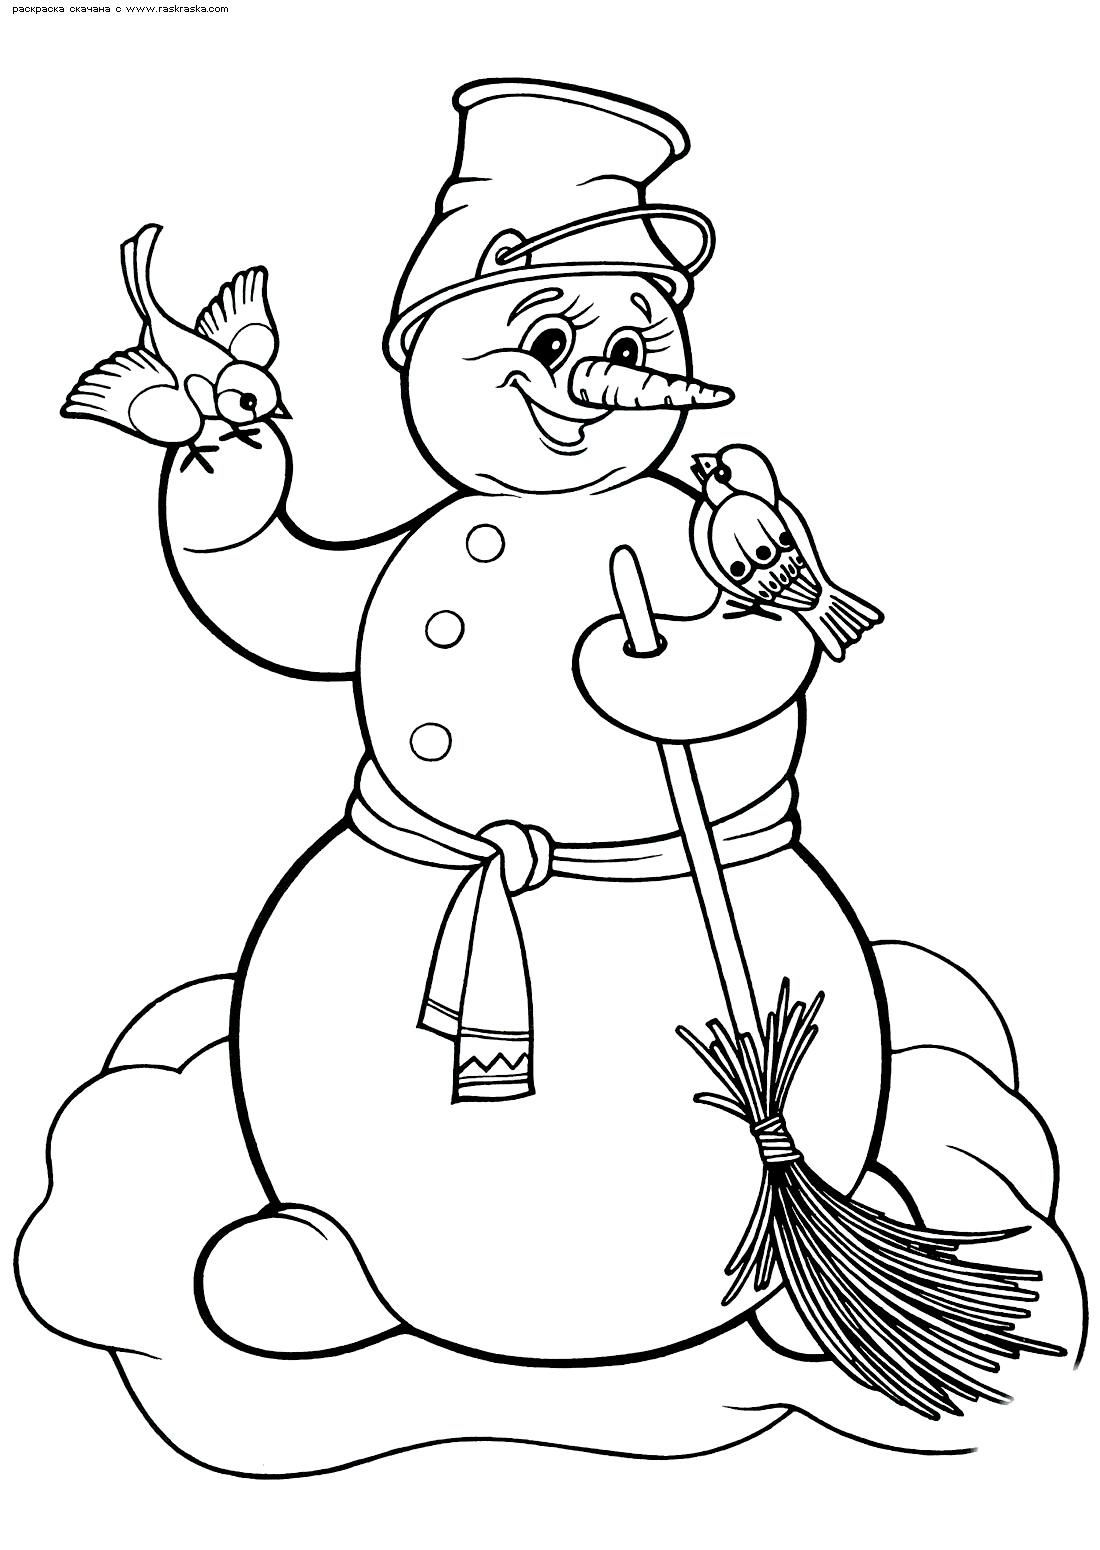 Раскраска Снеговик. Раскраска снеговик